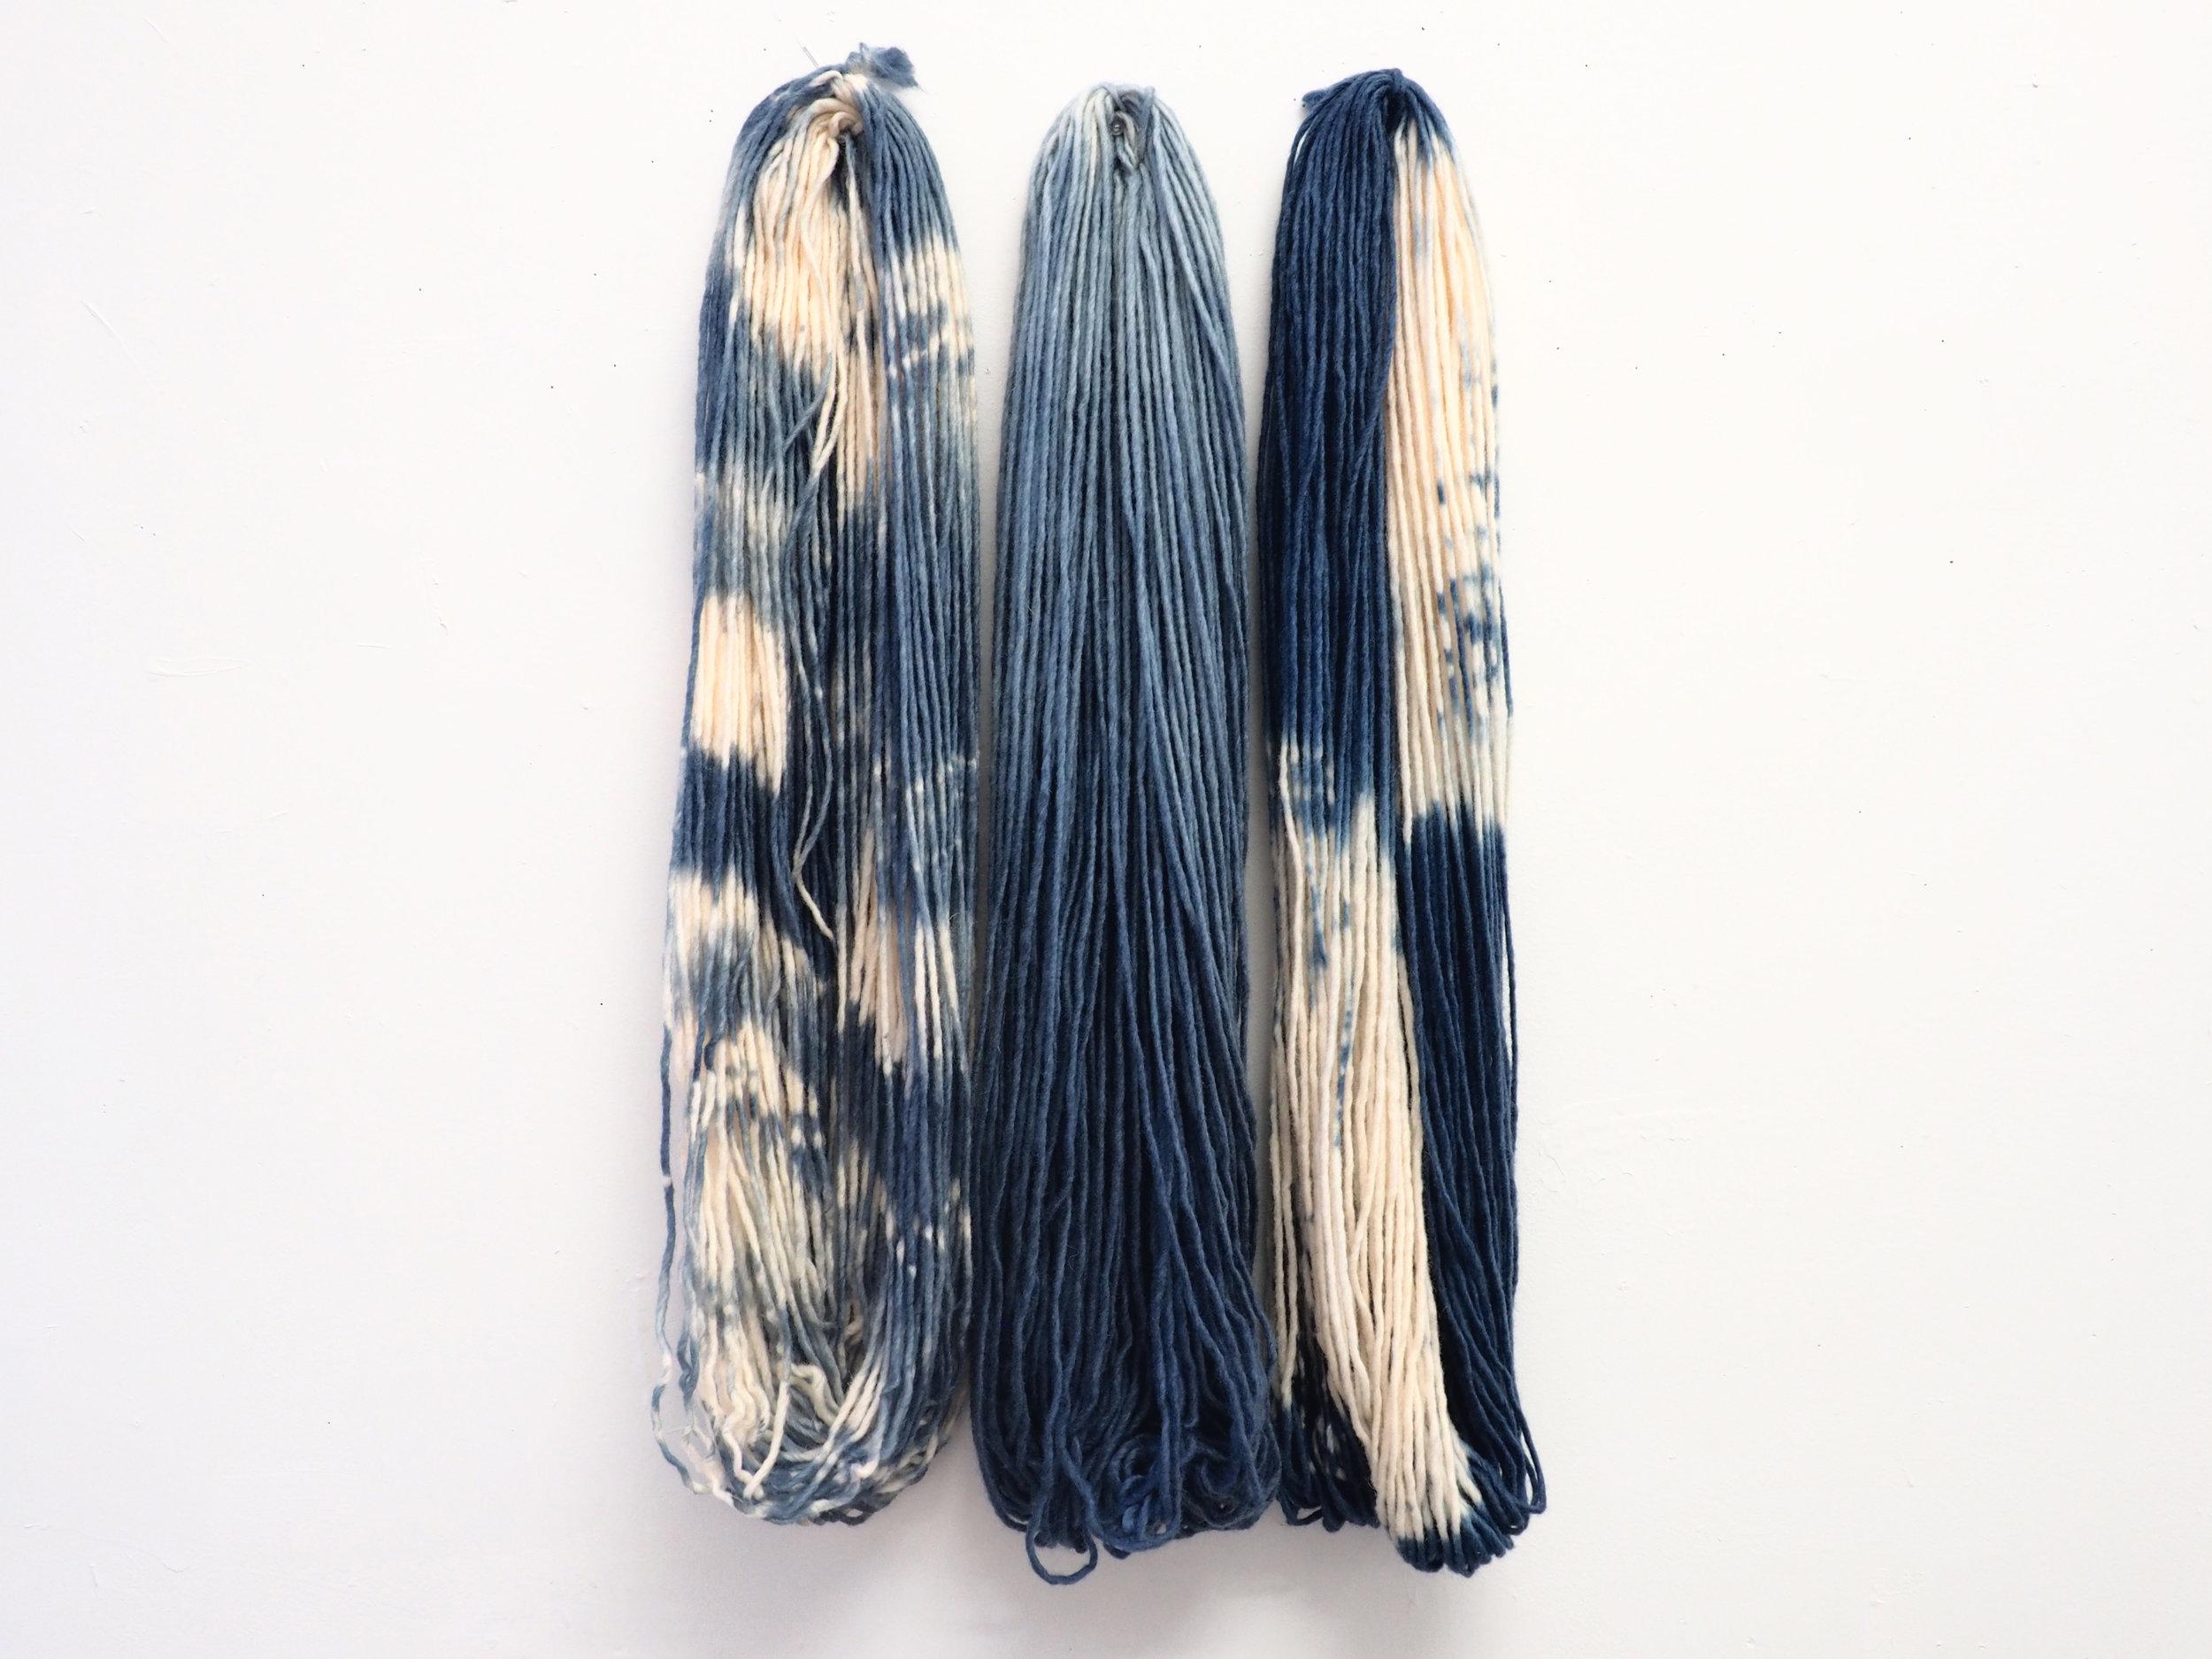 Natural indigo-dyed wool 25 x 12 in 2017